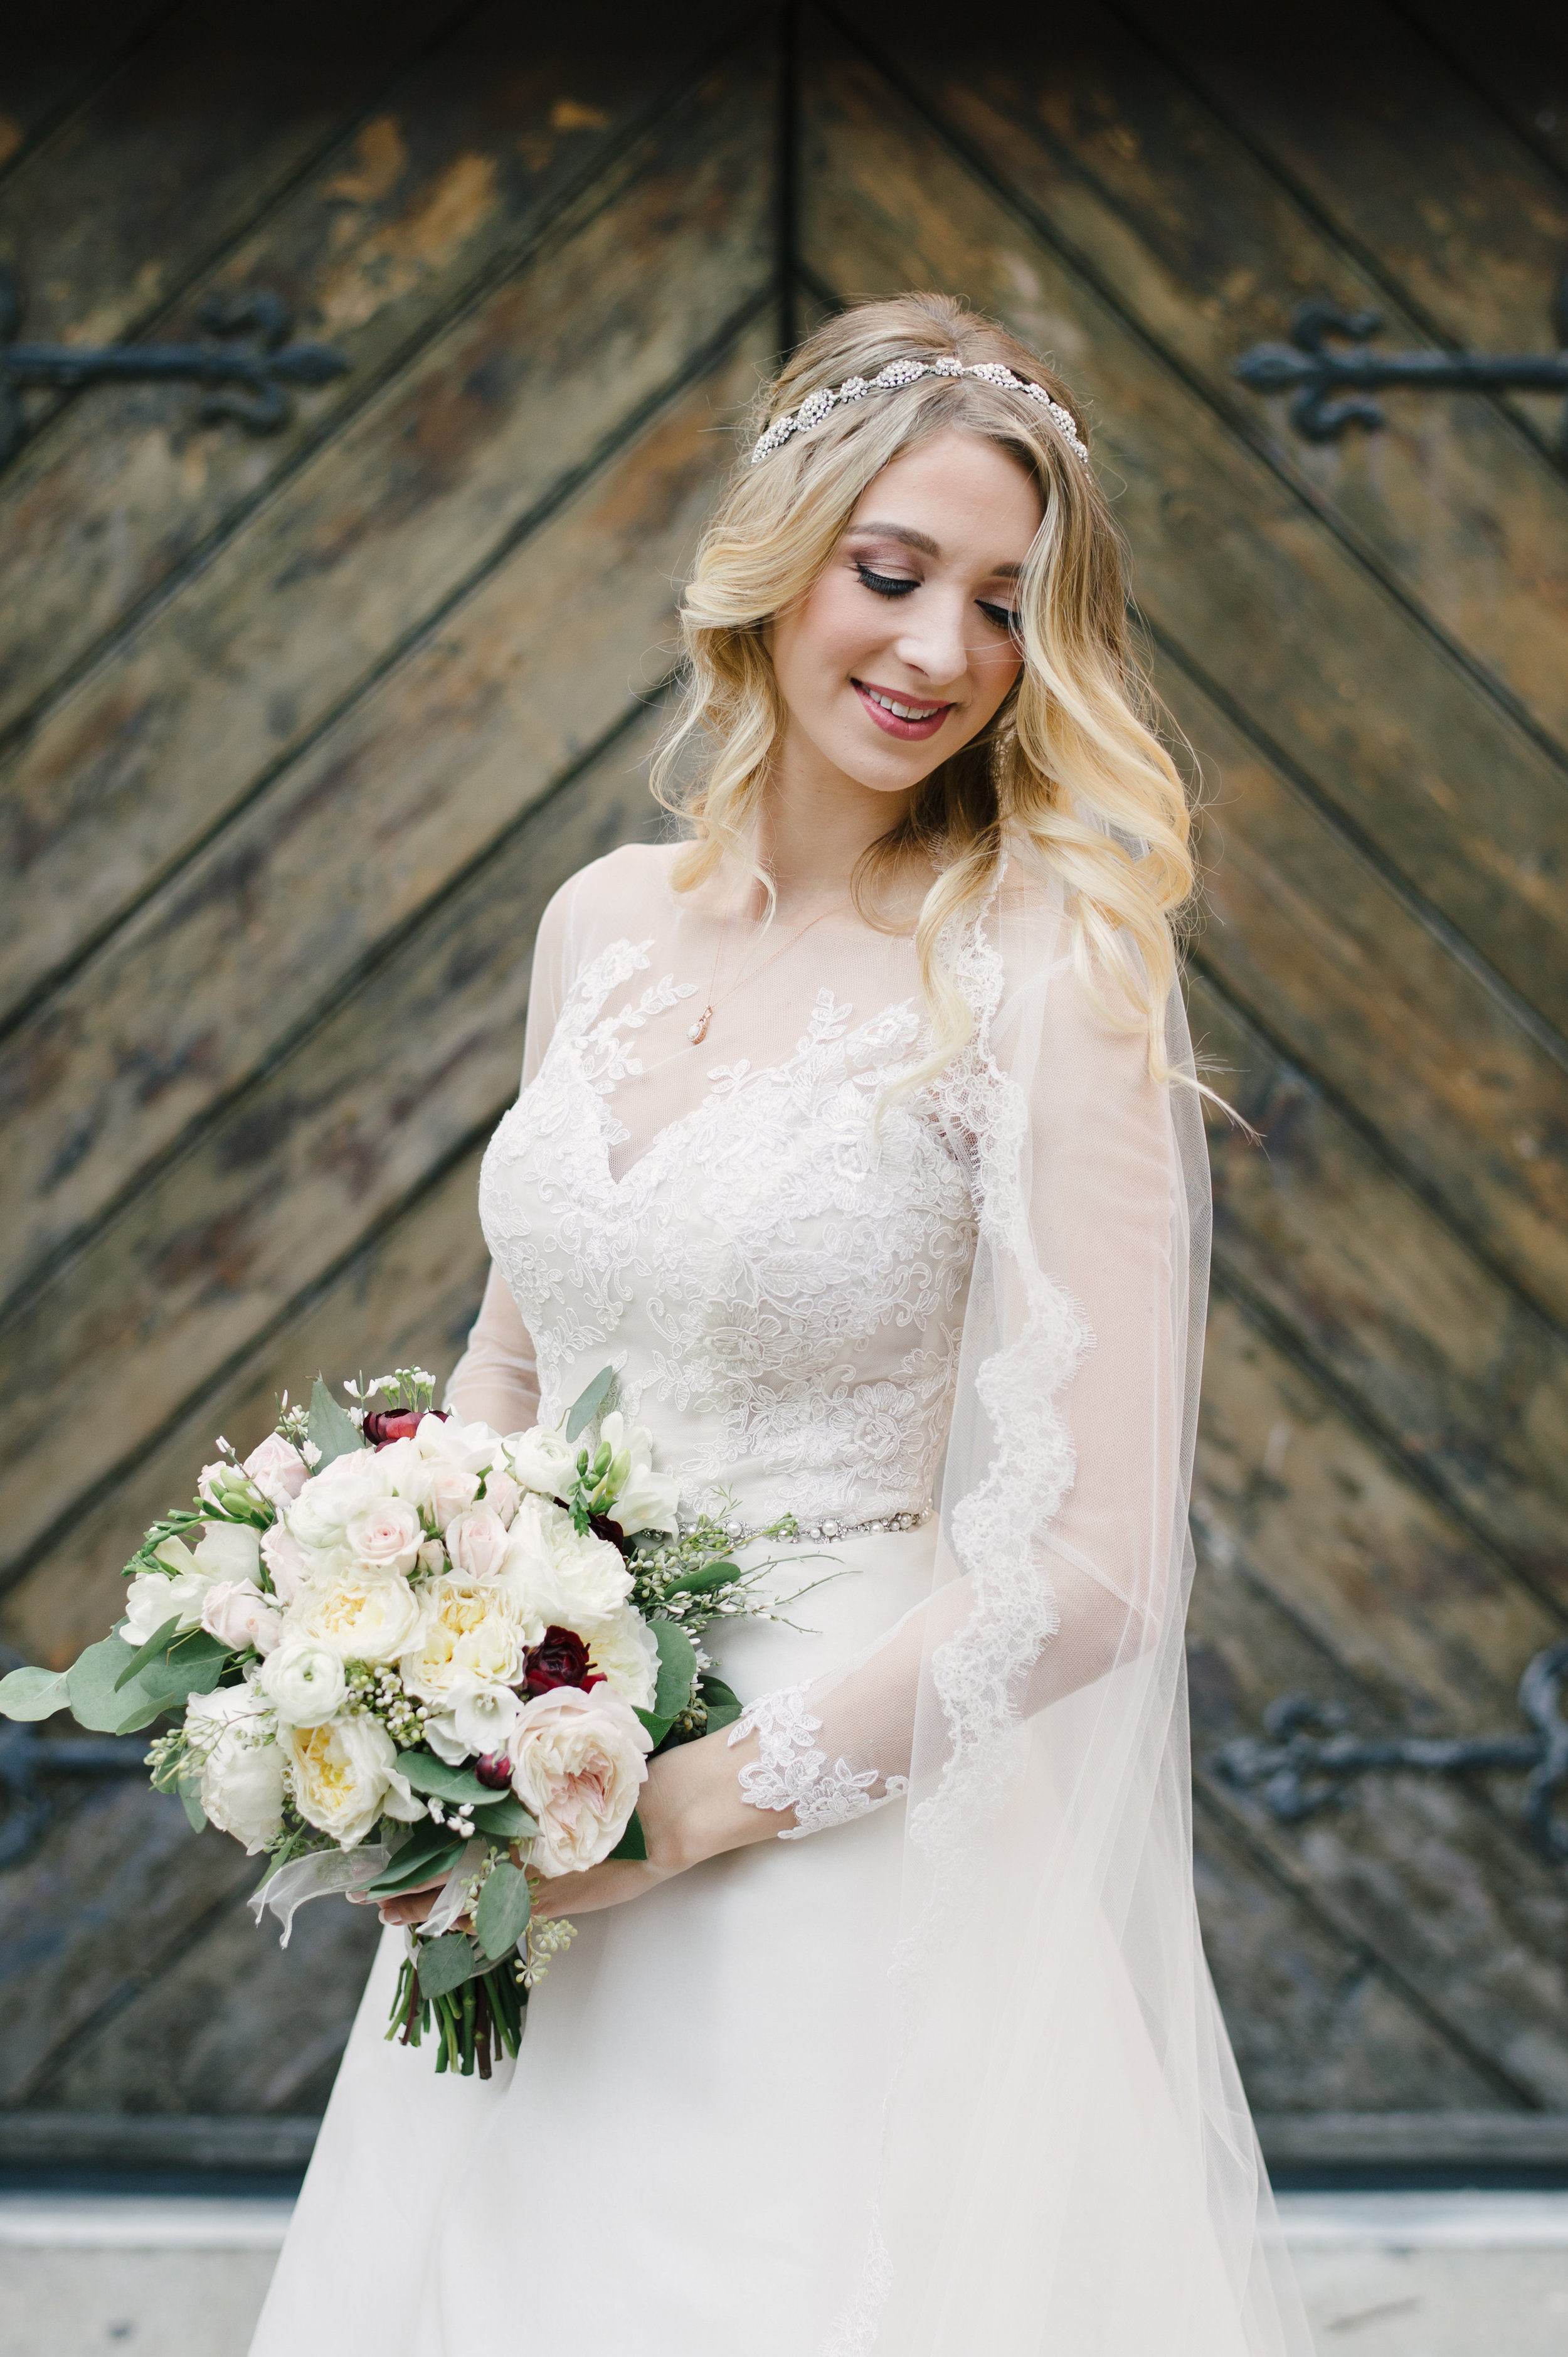 Portraits-Molo-Wedding-Sarah-Street-Photography-115.jpg